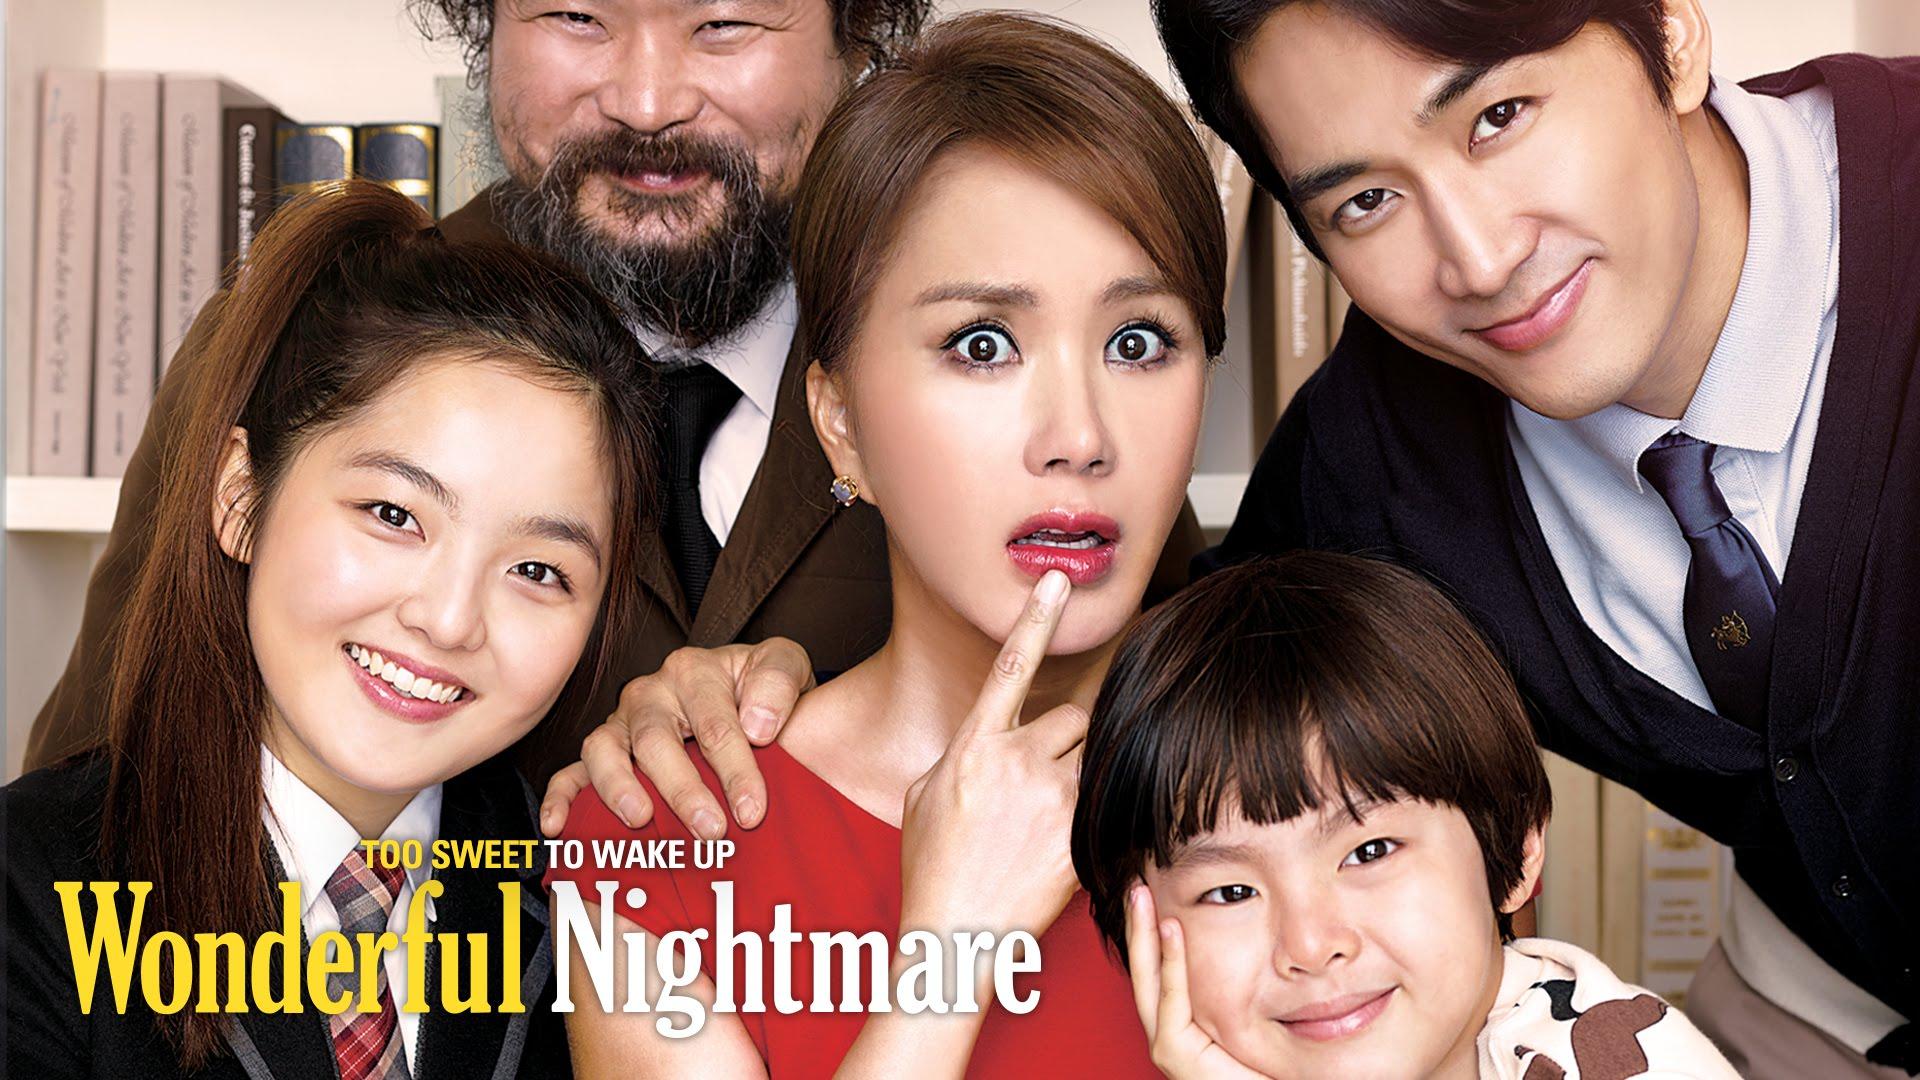 Wonderful Nightmare (미쓰 와이프)